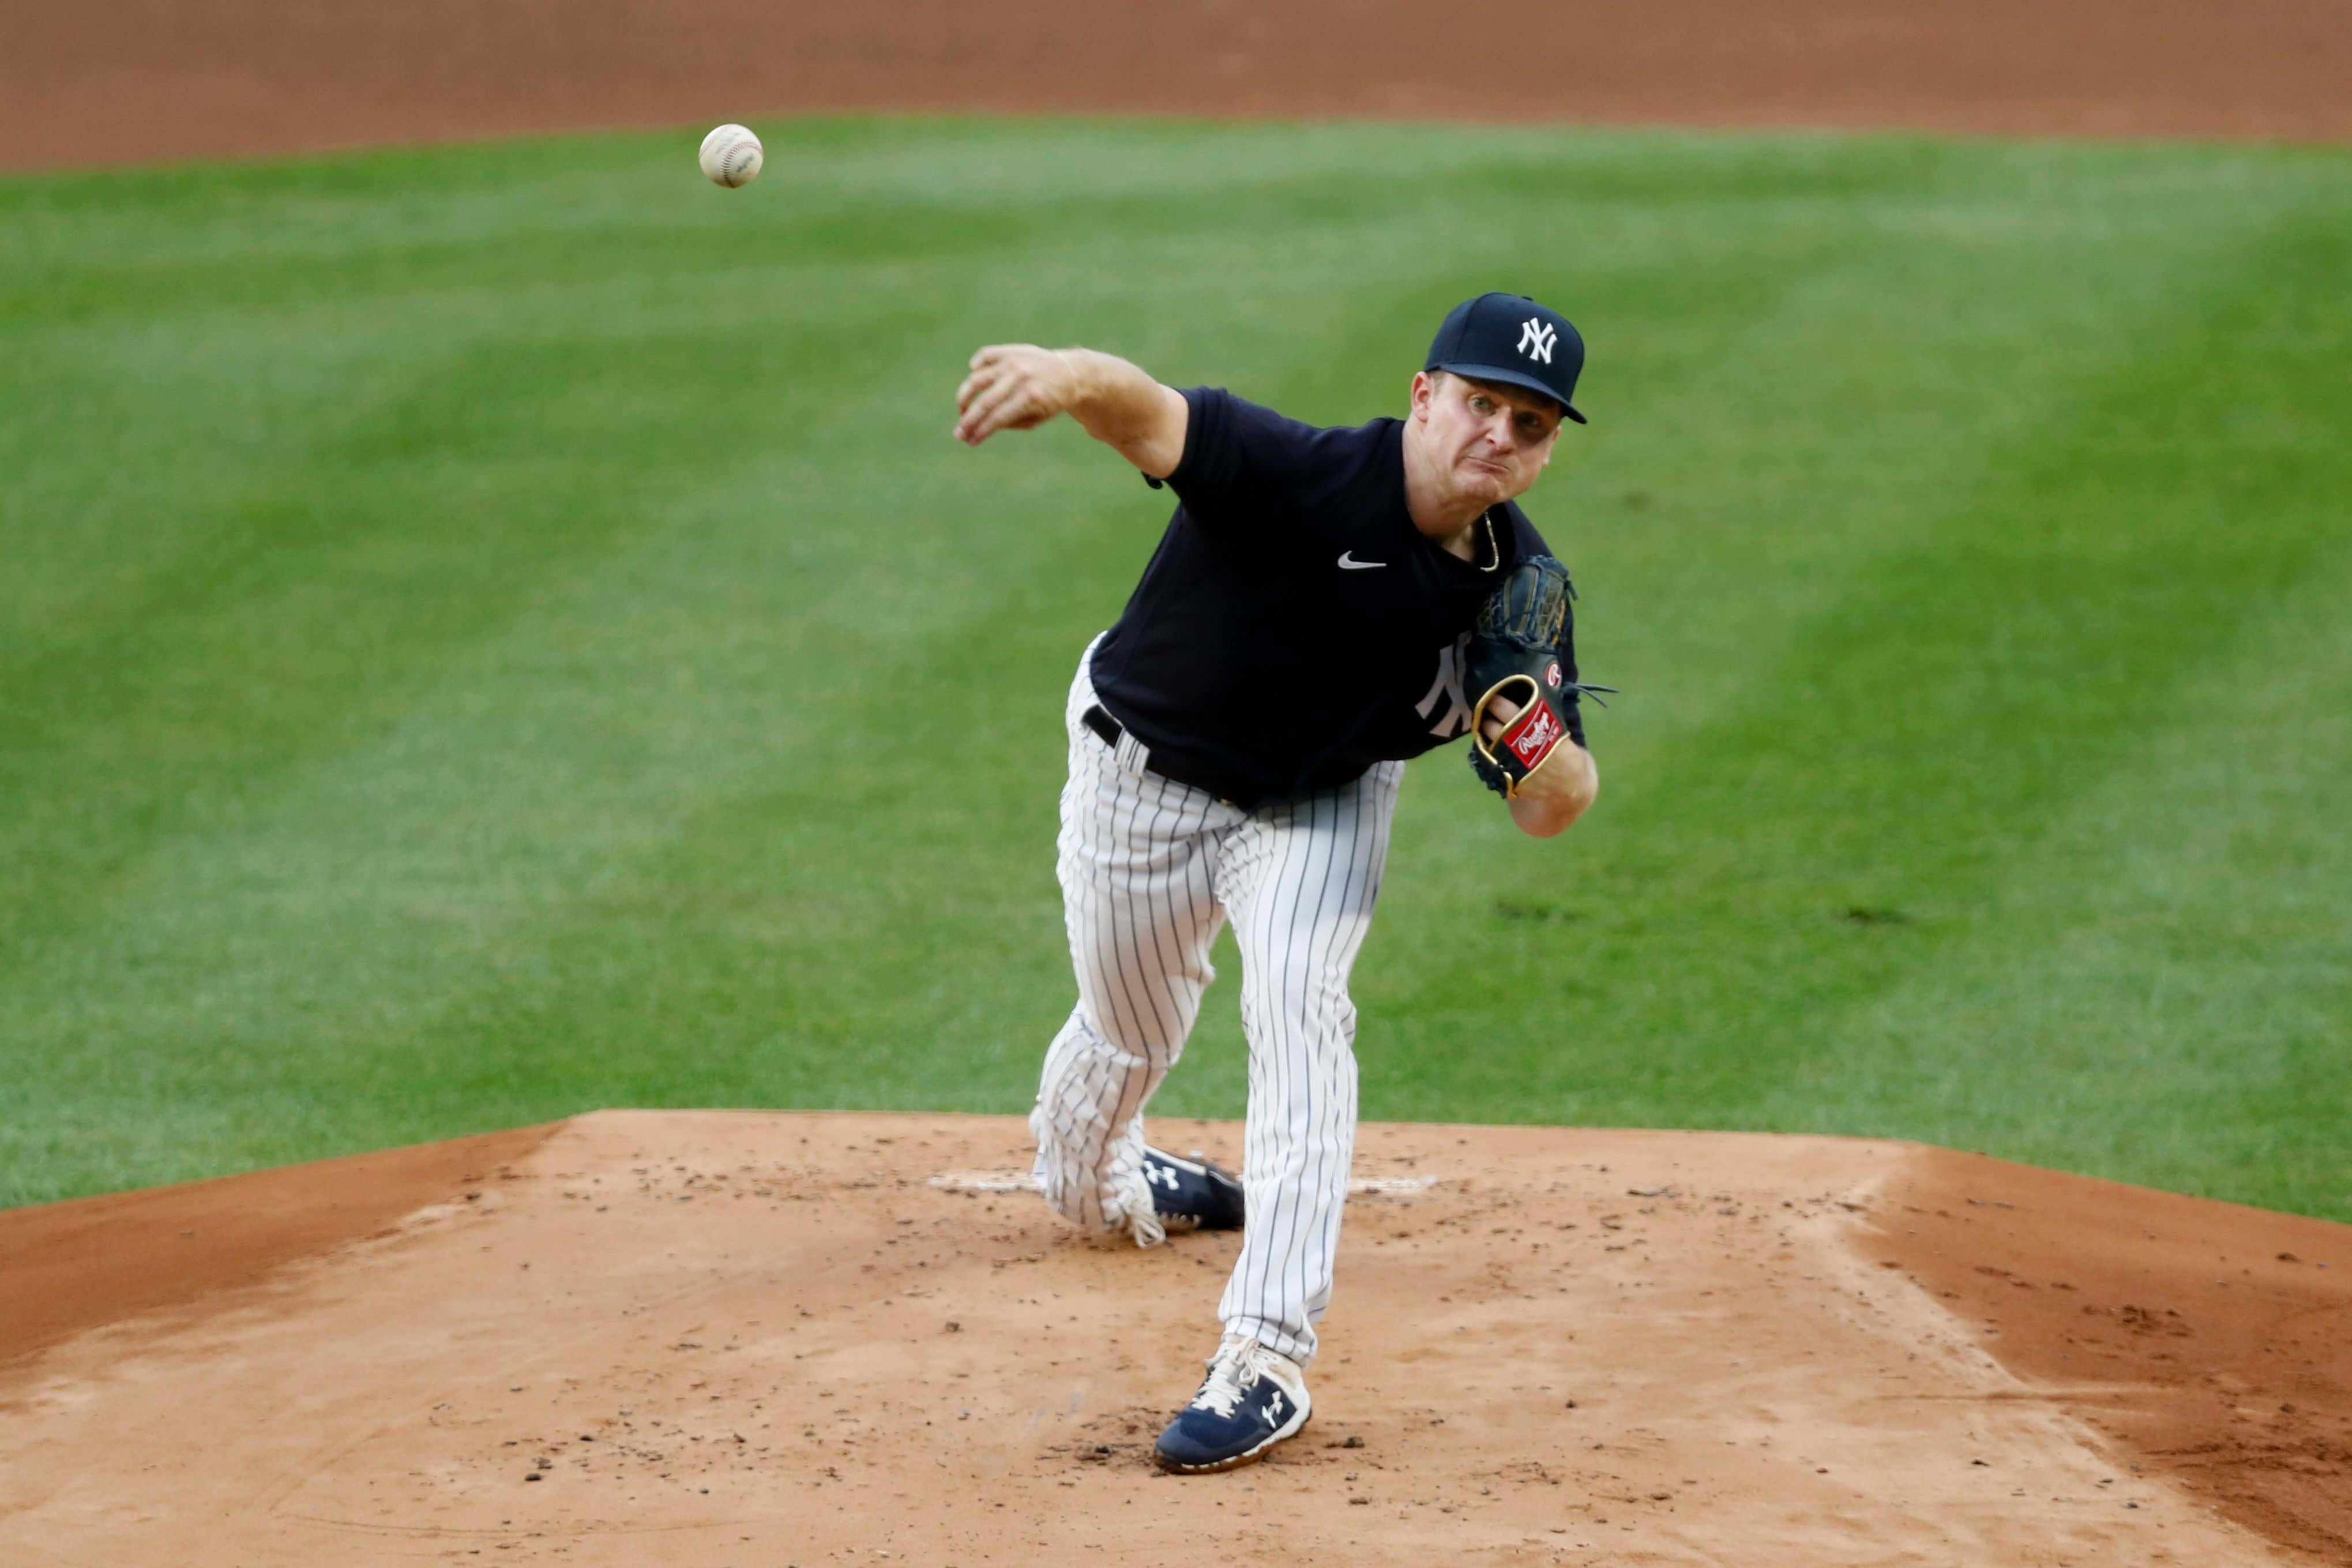 Yankees Baseball, New York, United States - 06 Jul 2020